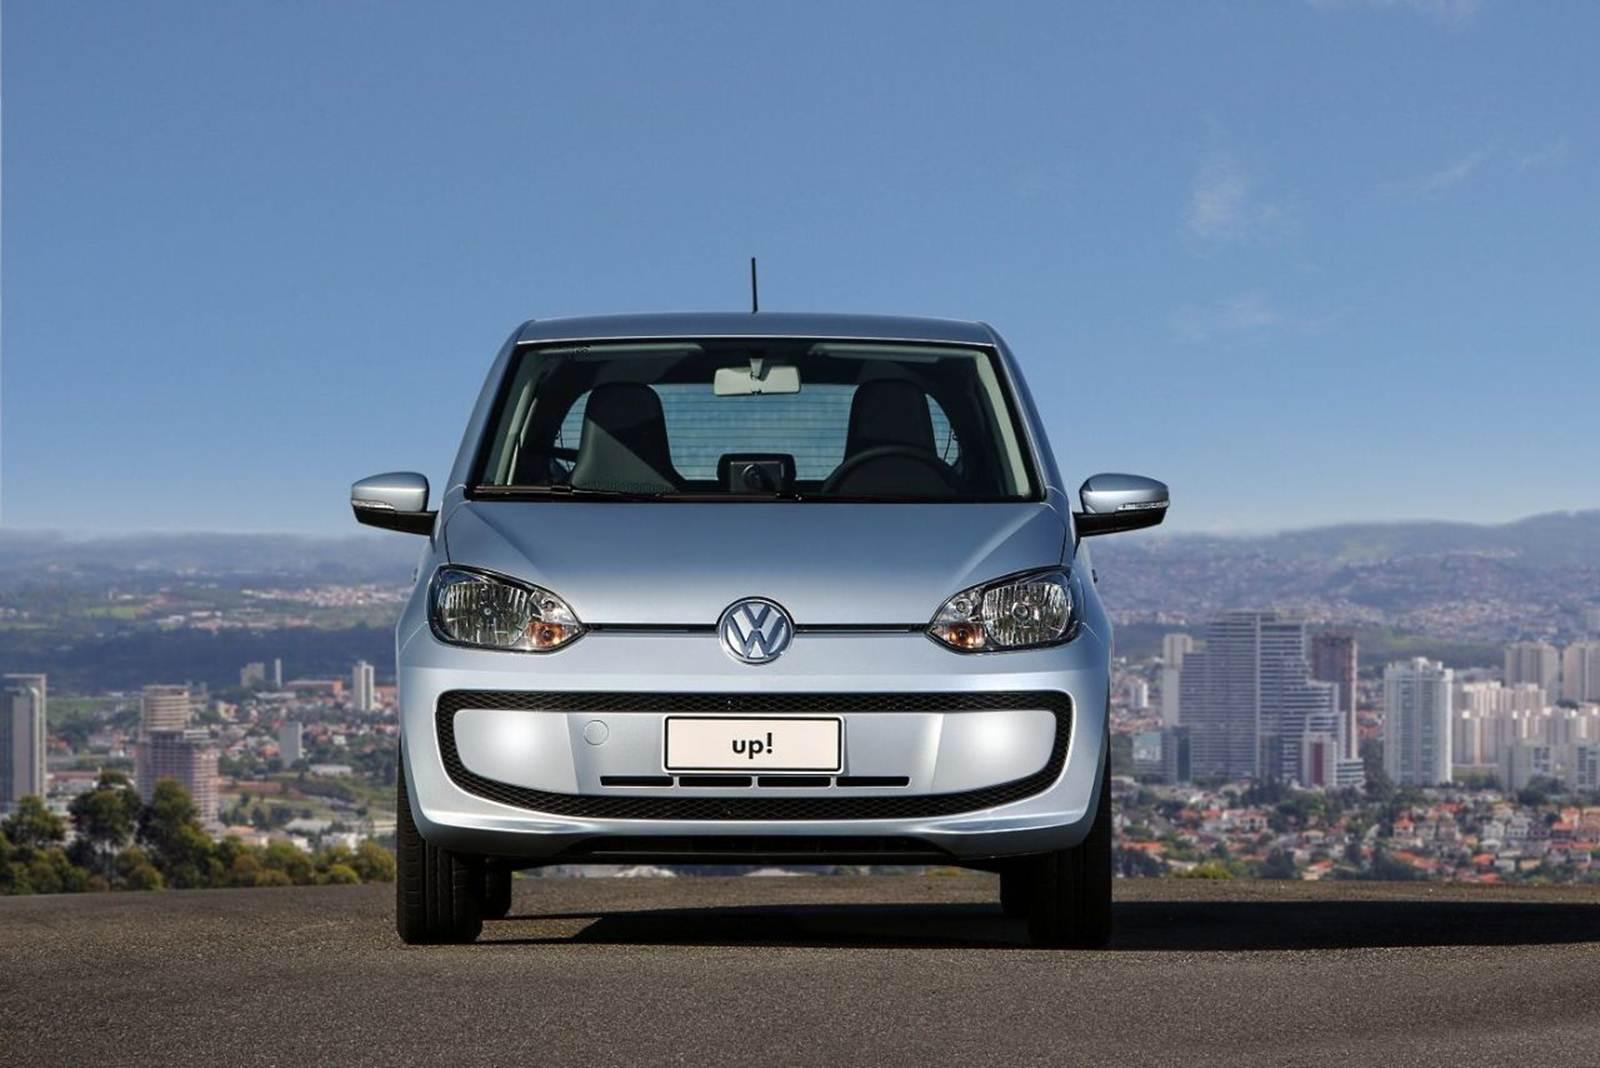 Volkswagen move-up! - versão intermediária